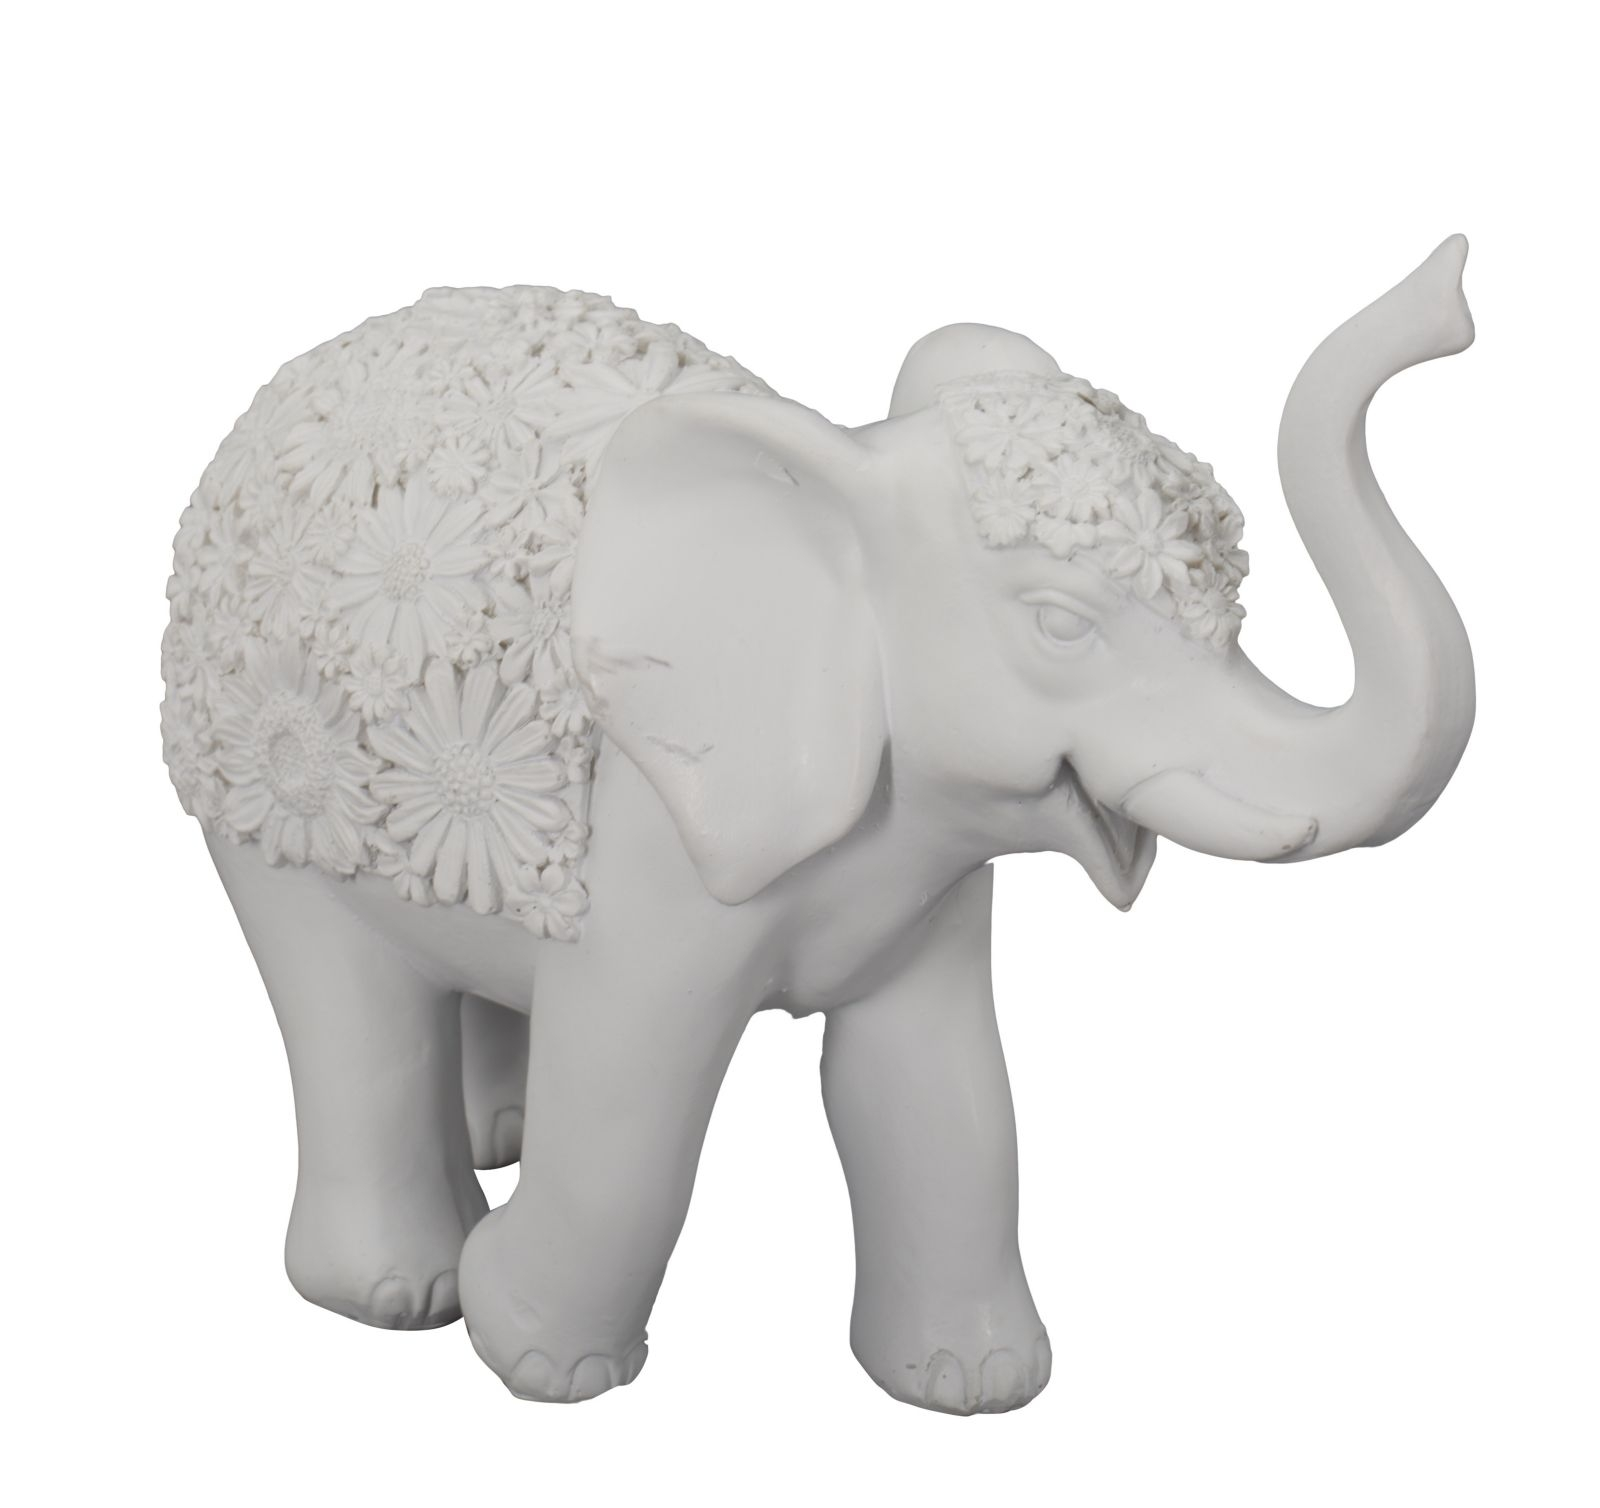 Decoratiune din rasina Elefante B Gri, l25,5xA9xH21 cm imagine